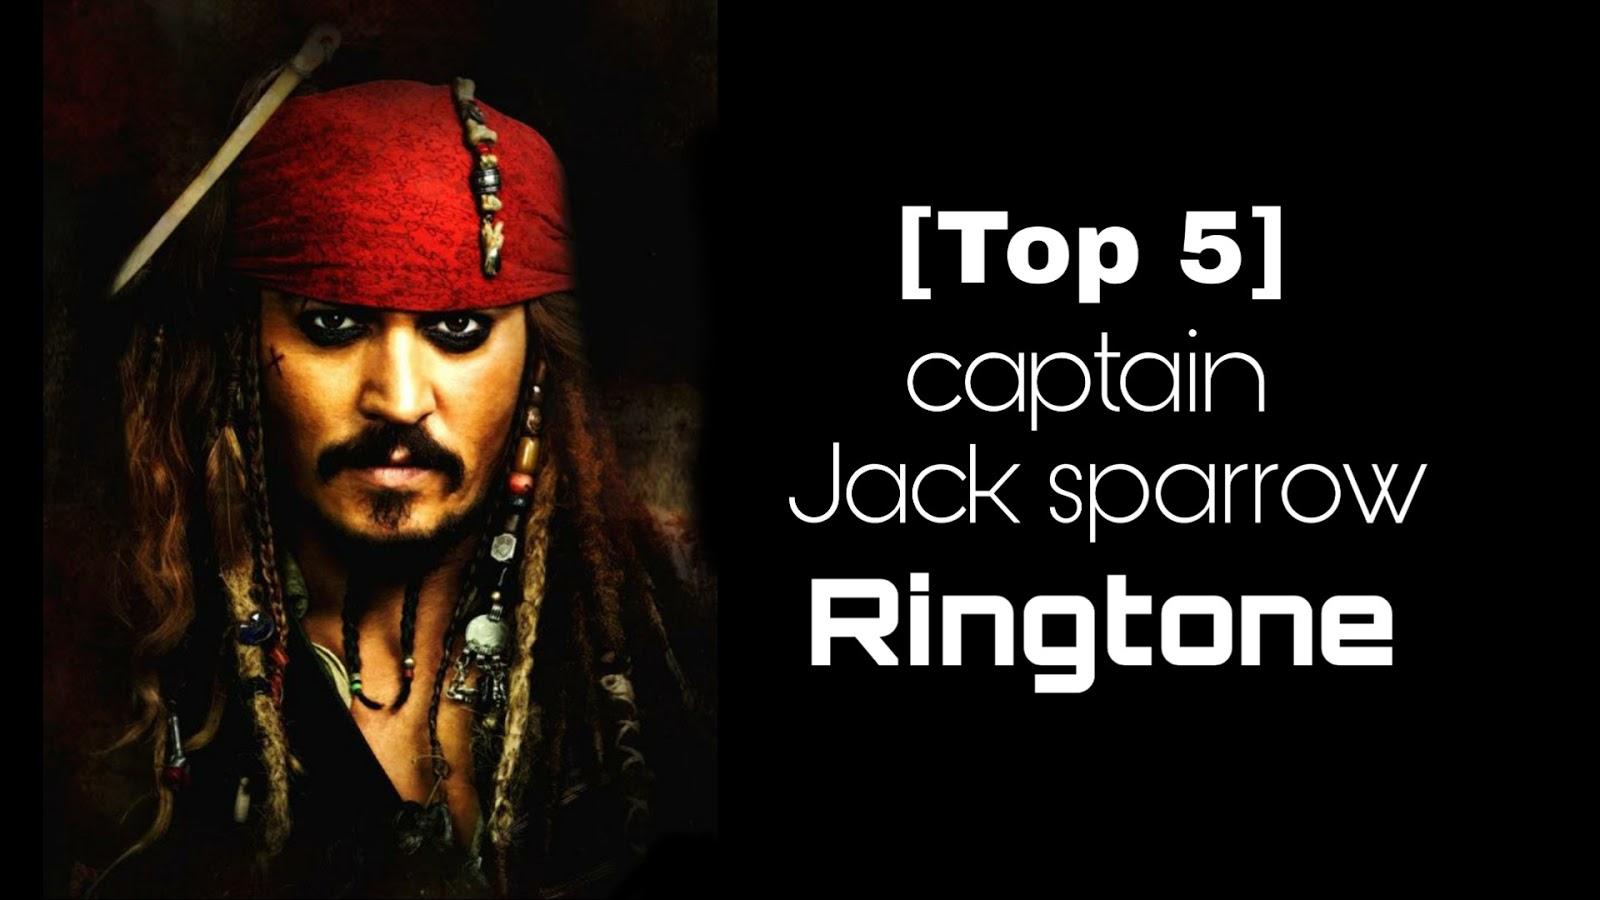 Top 5 pirates of the Caribbean Ringtone | Jack sparrow